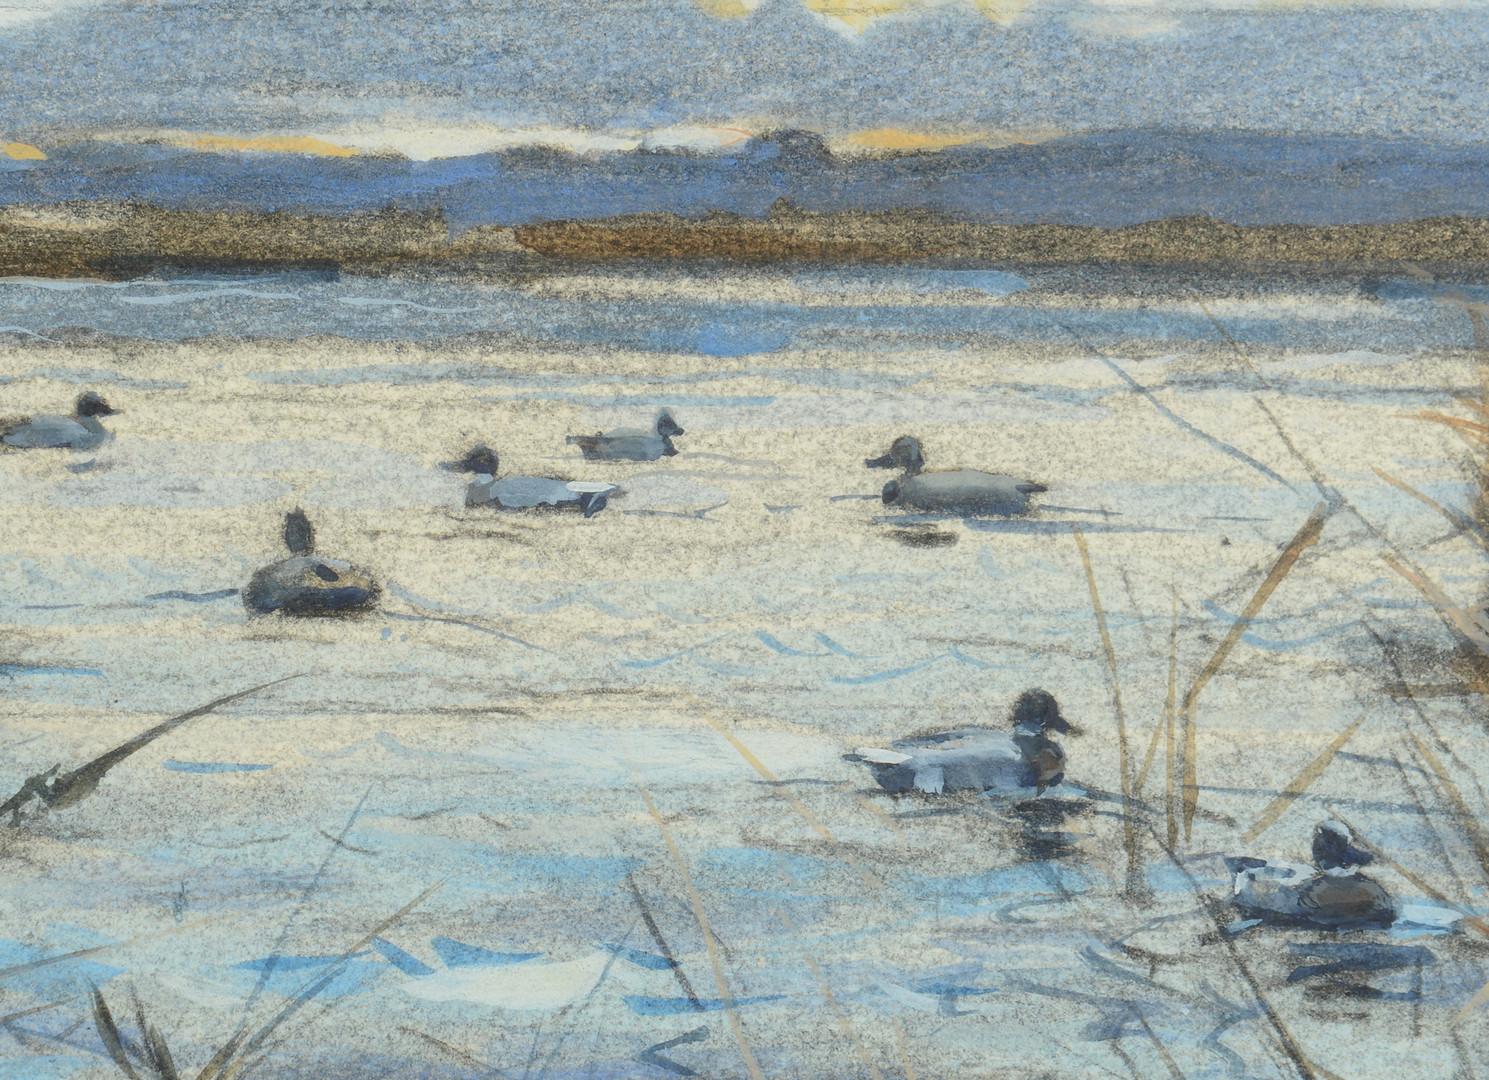 Lot 57: A. L. Ripley, Duck Hunting Scene